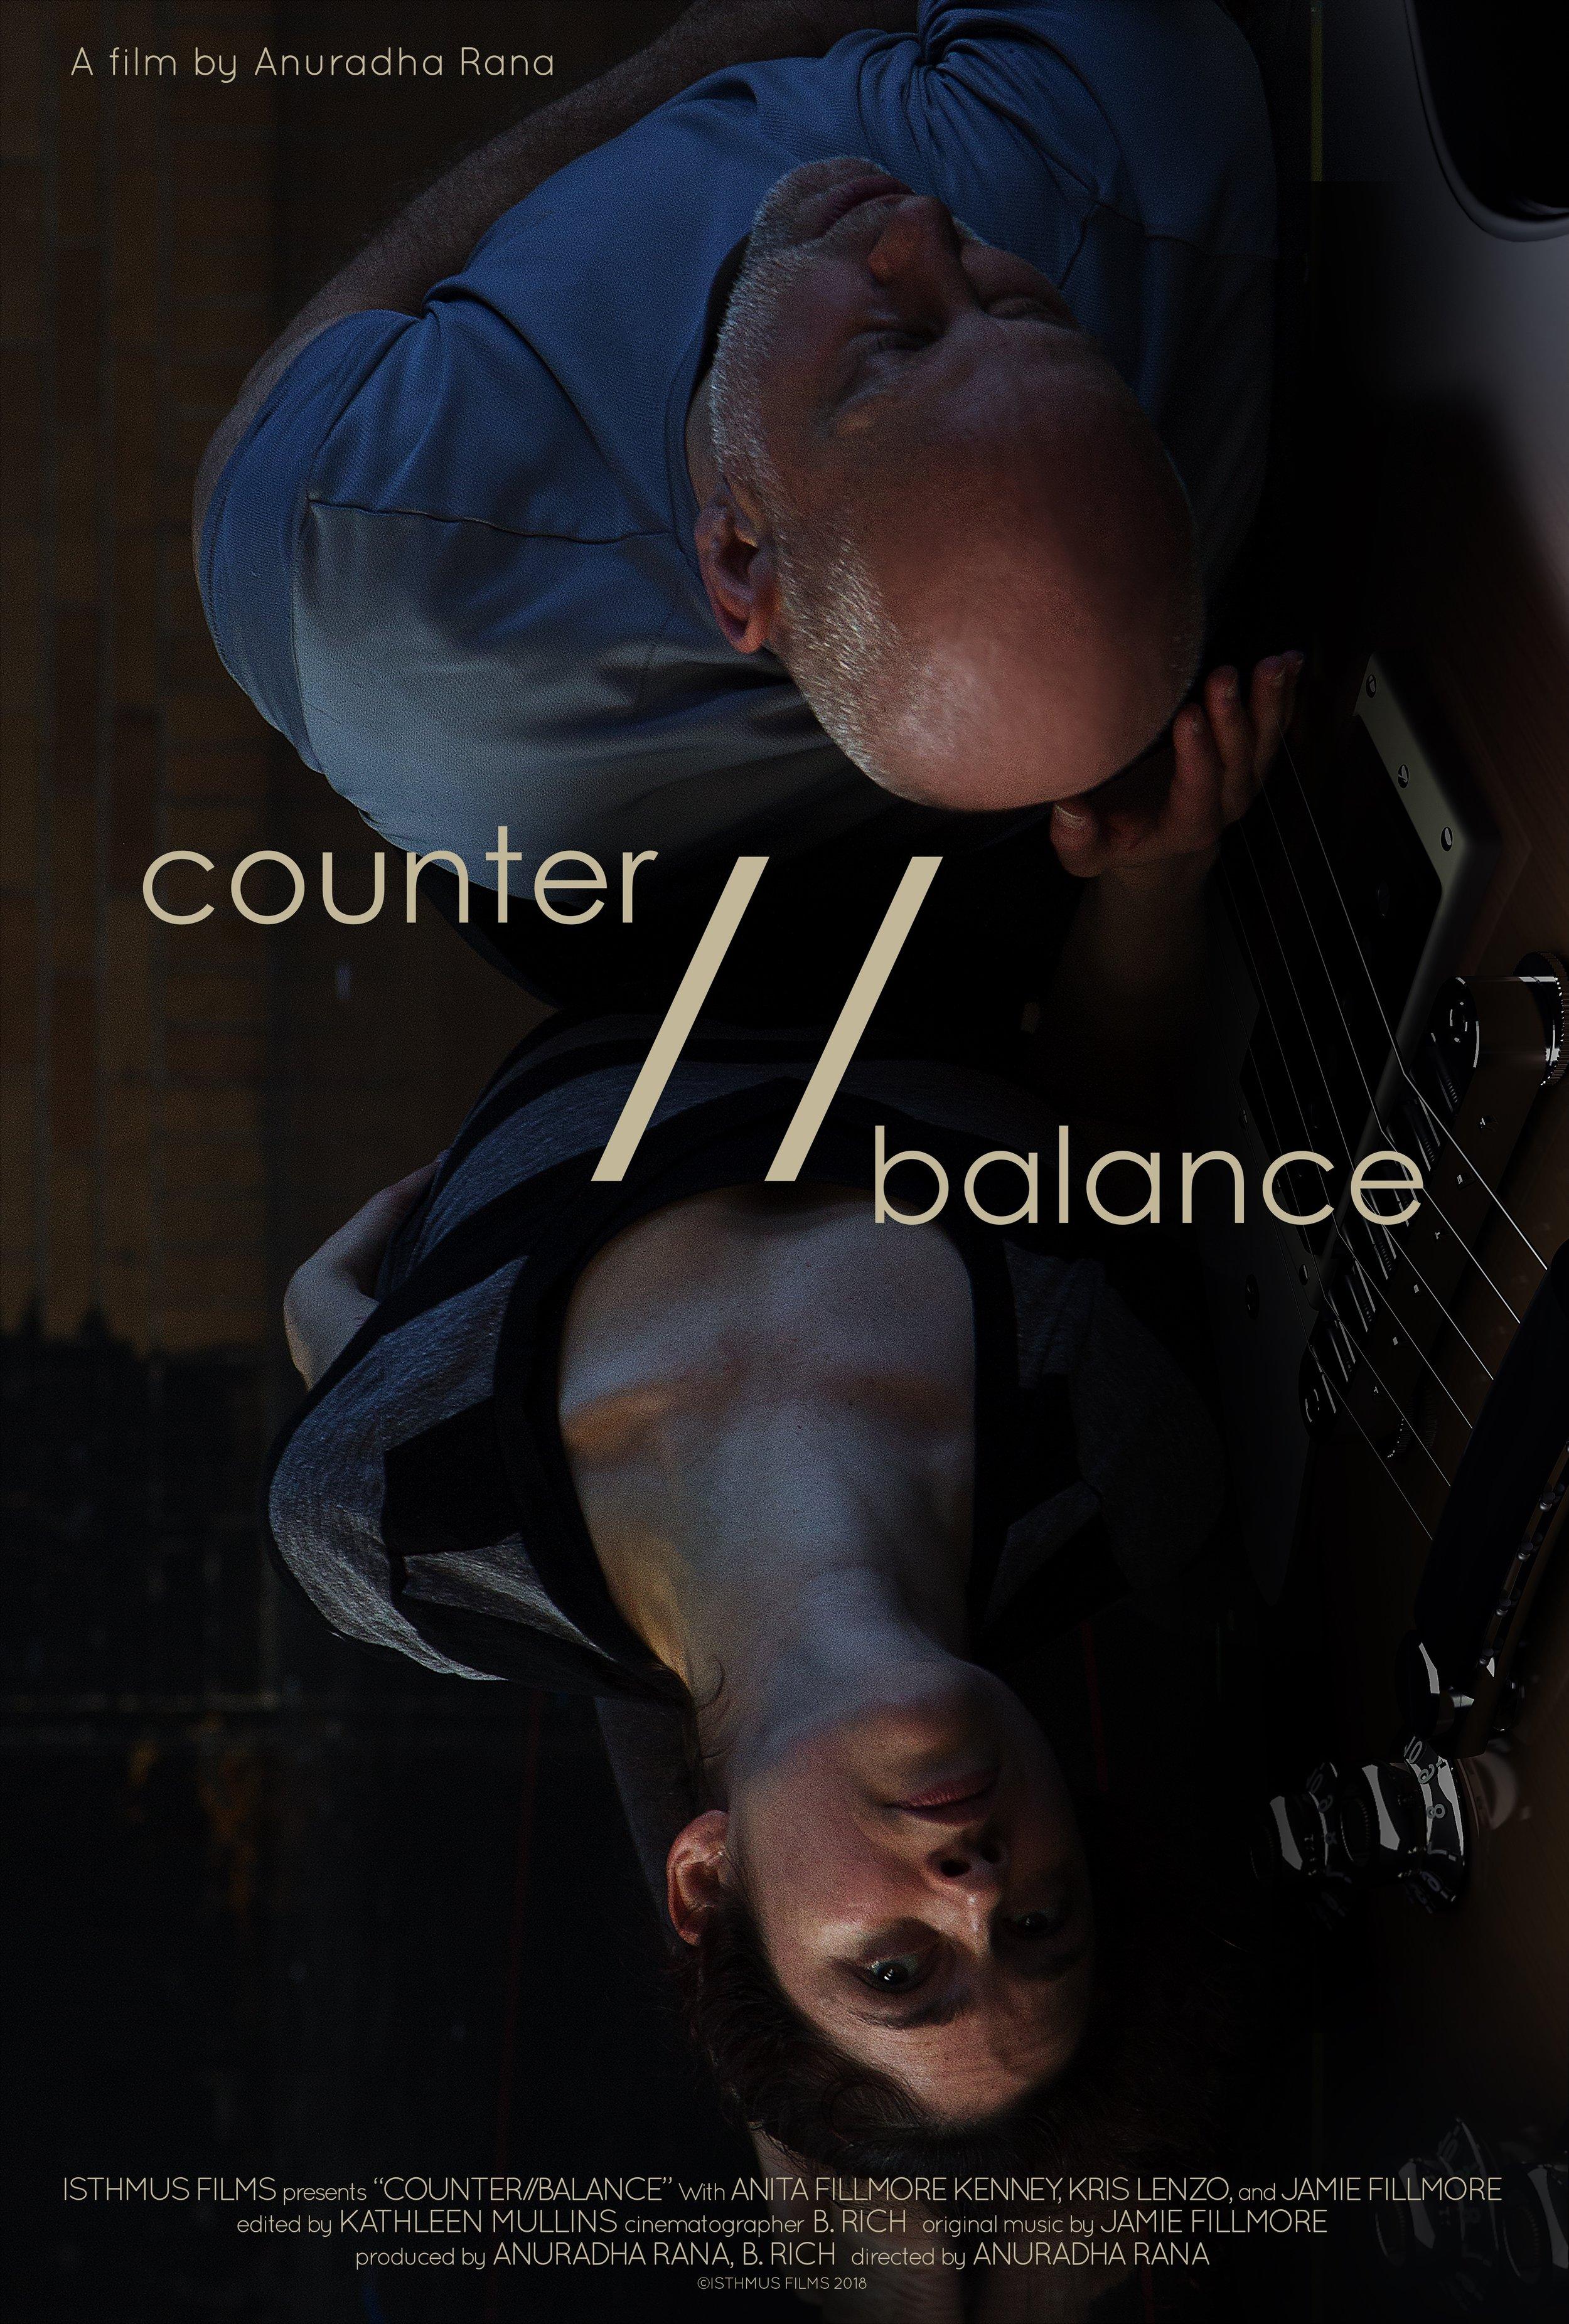 counter//balance poster